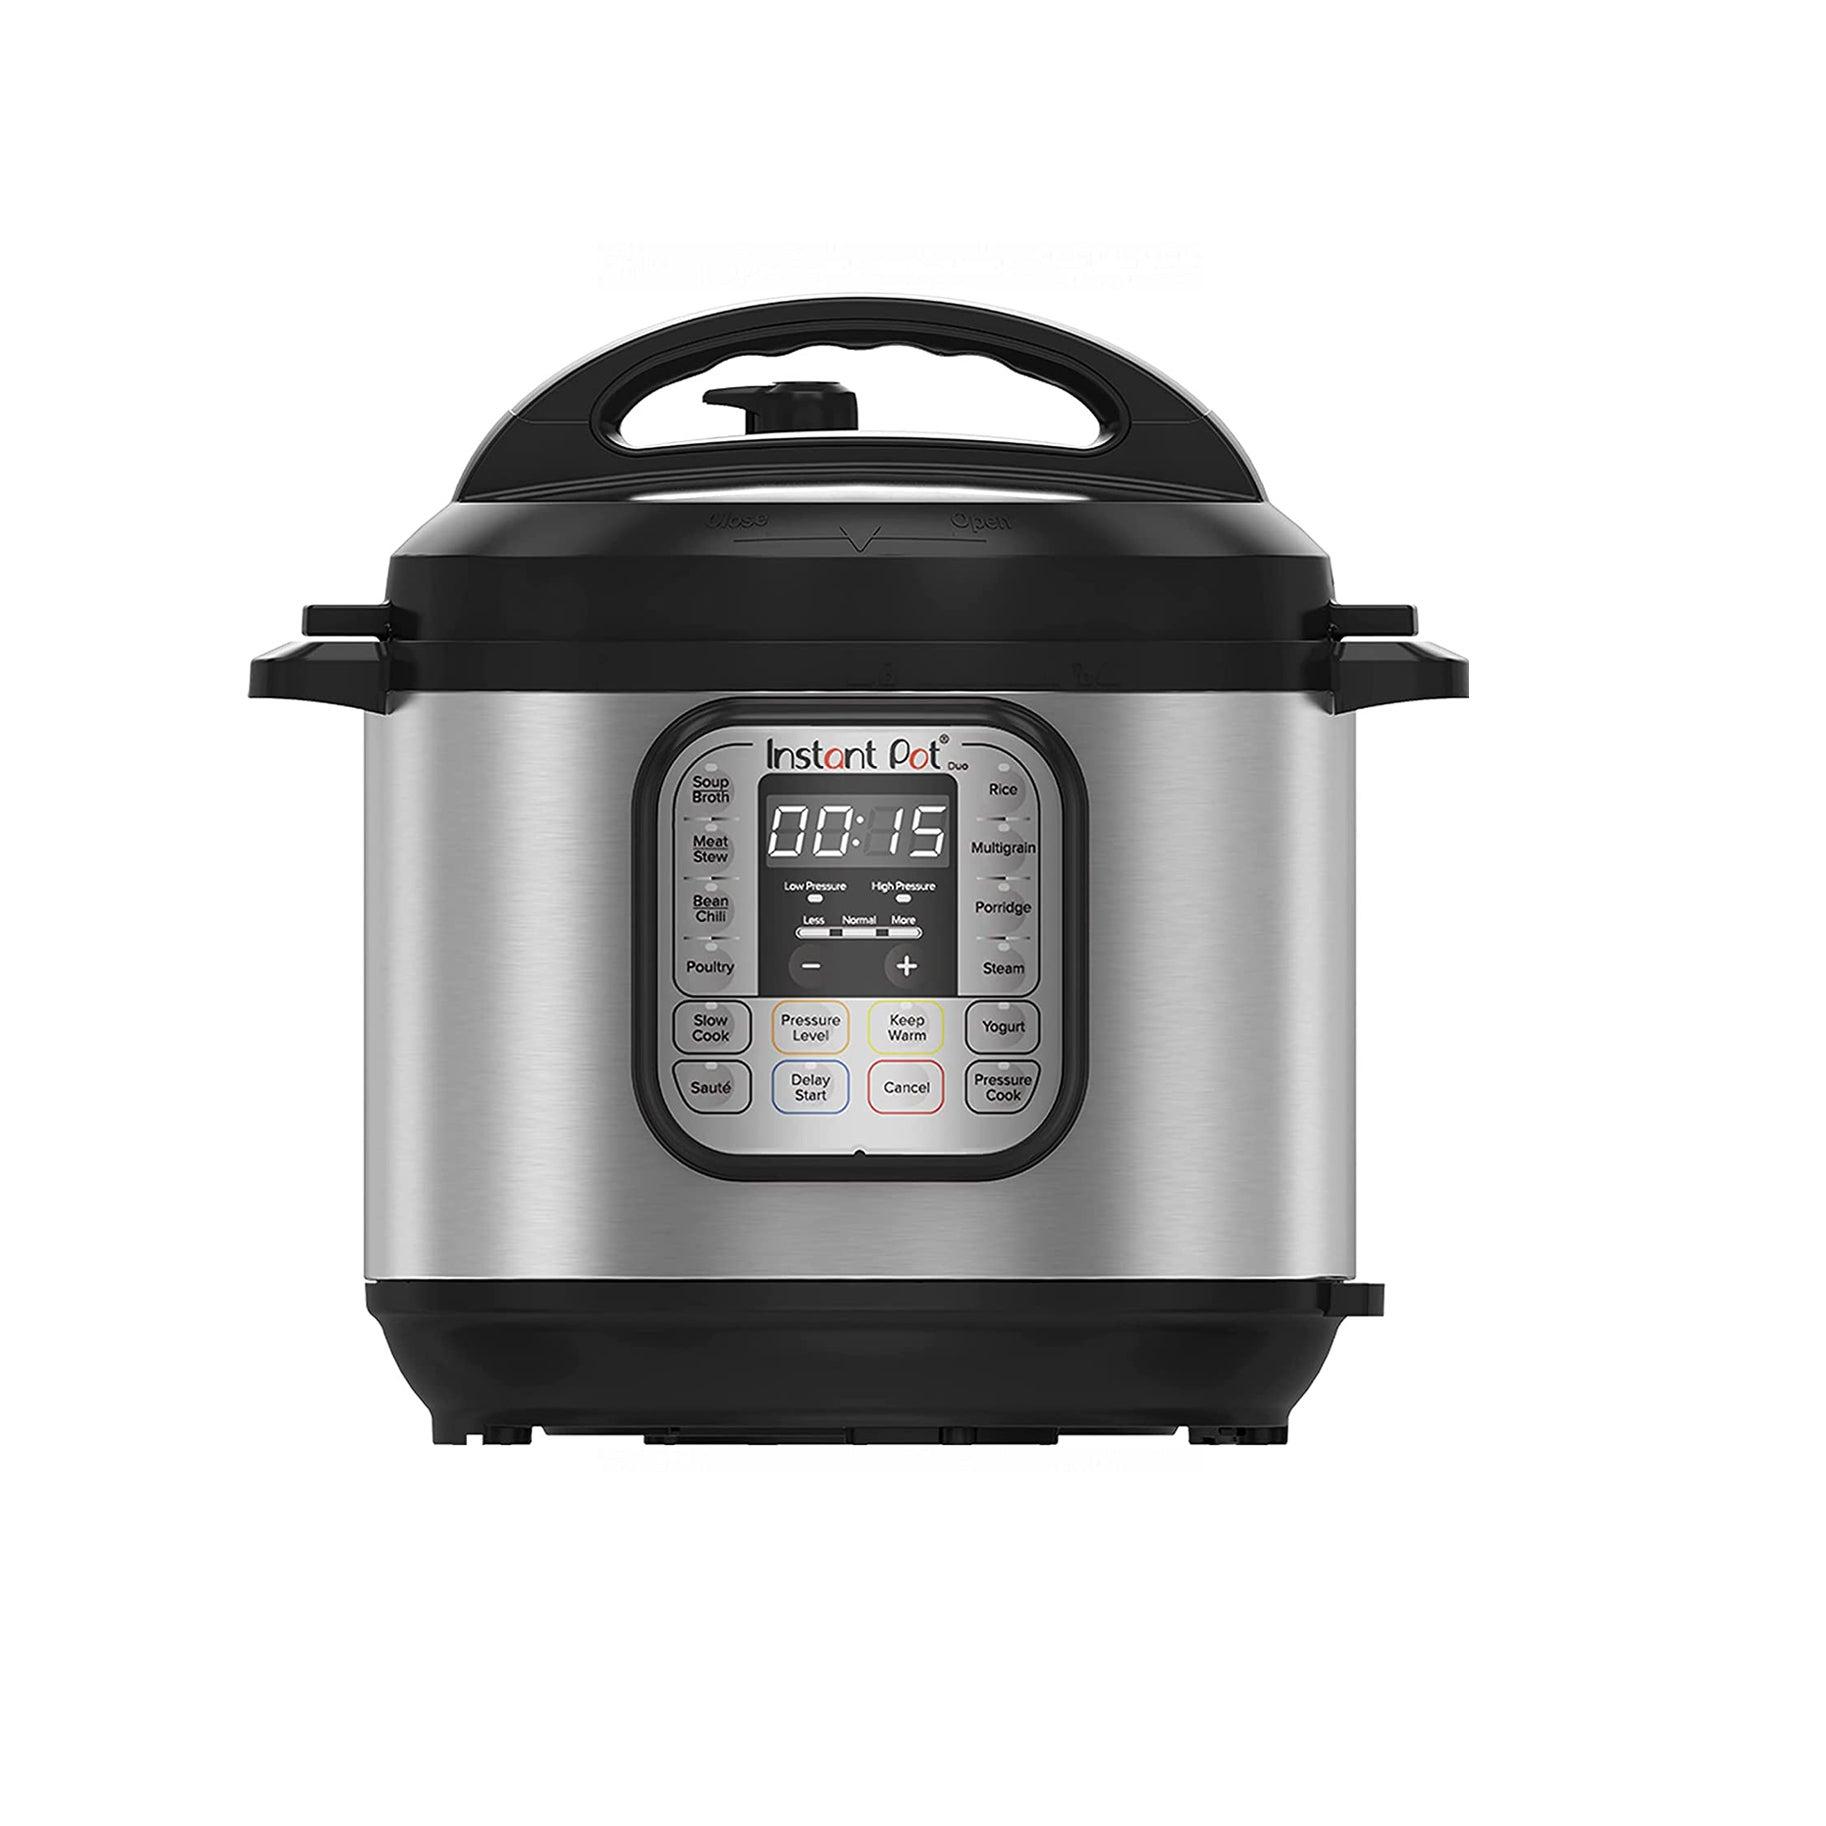 The Best Pressure Cooker Option: Instant Pot Pro 6 Quart